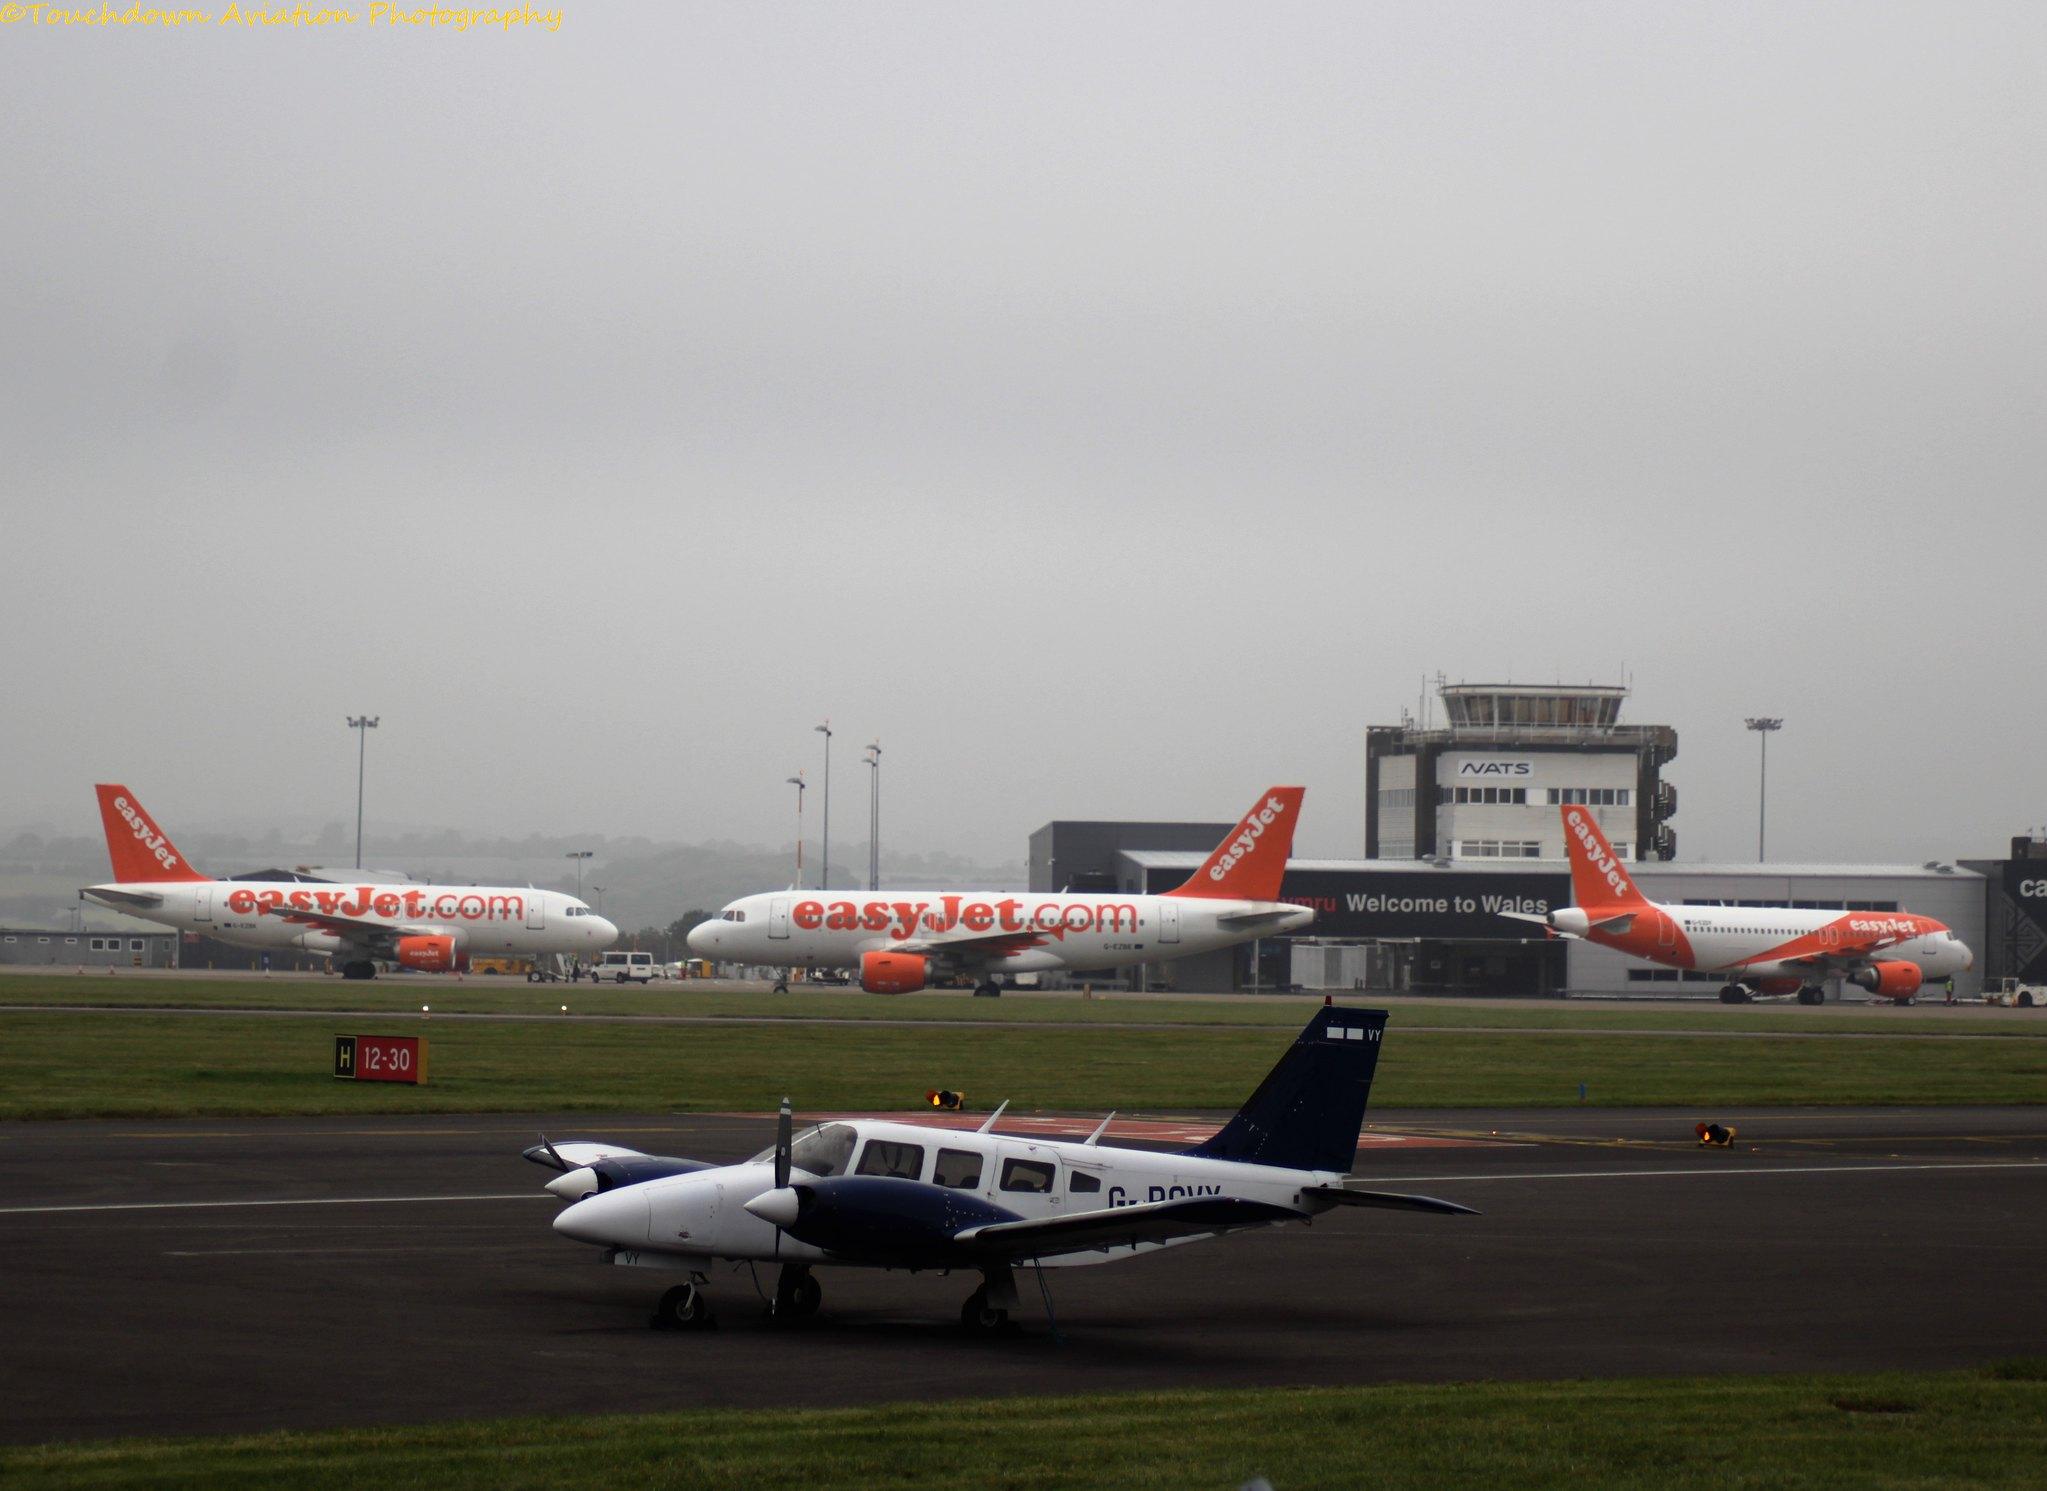 EasyJet Airbus A319 G-EZBK & G-EZBE & G-EZDY 22OCT16